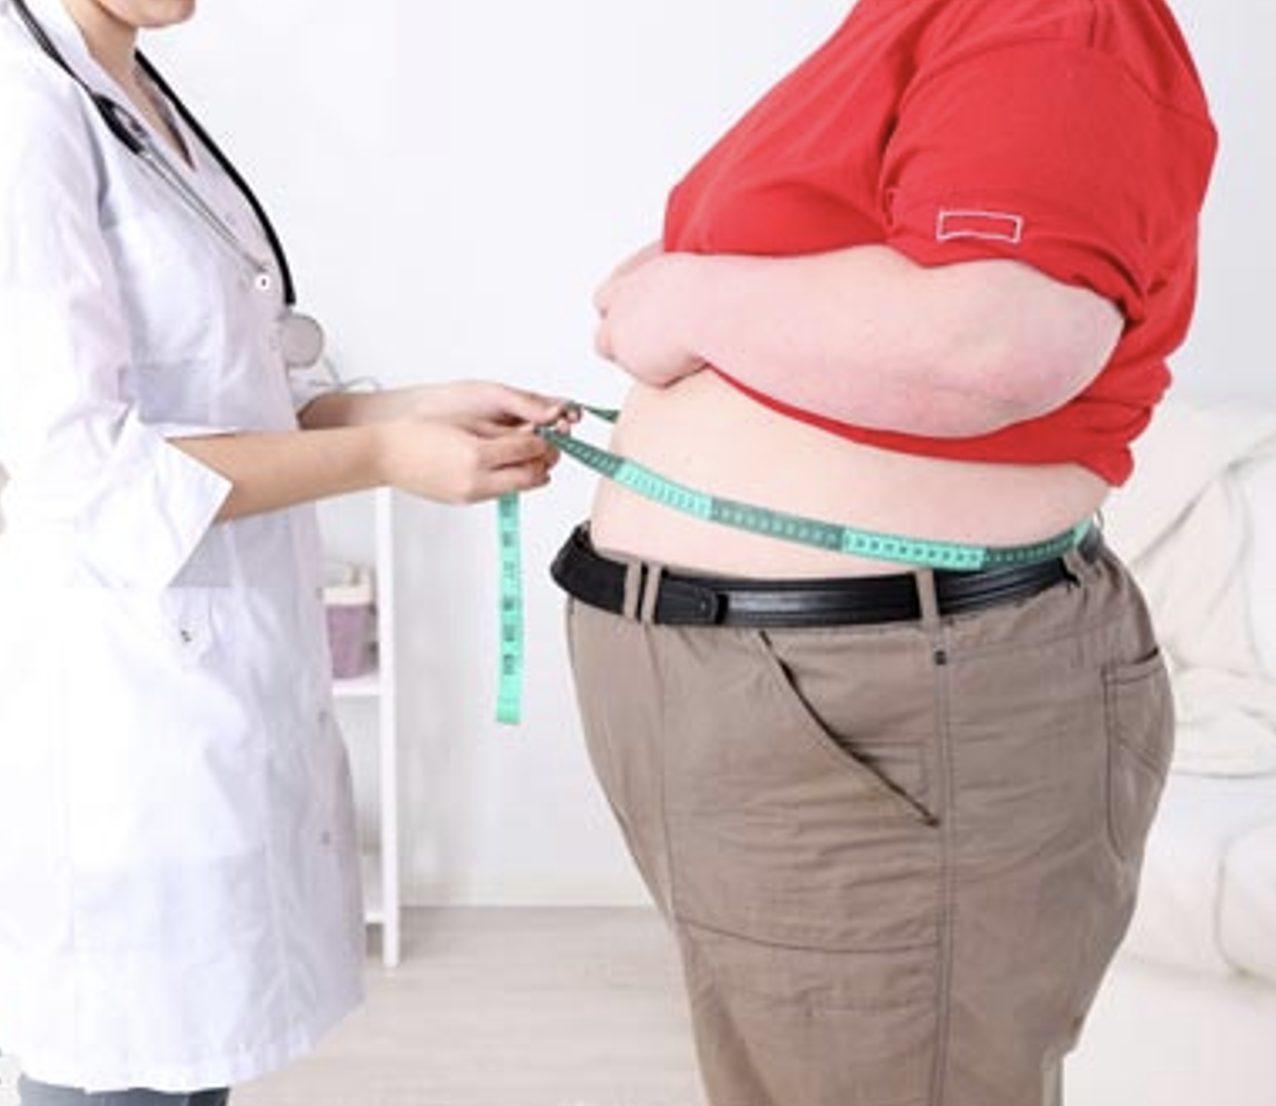 The Big Fat Misunderstanding!